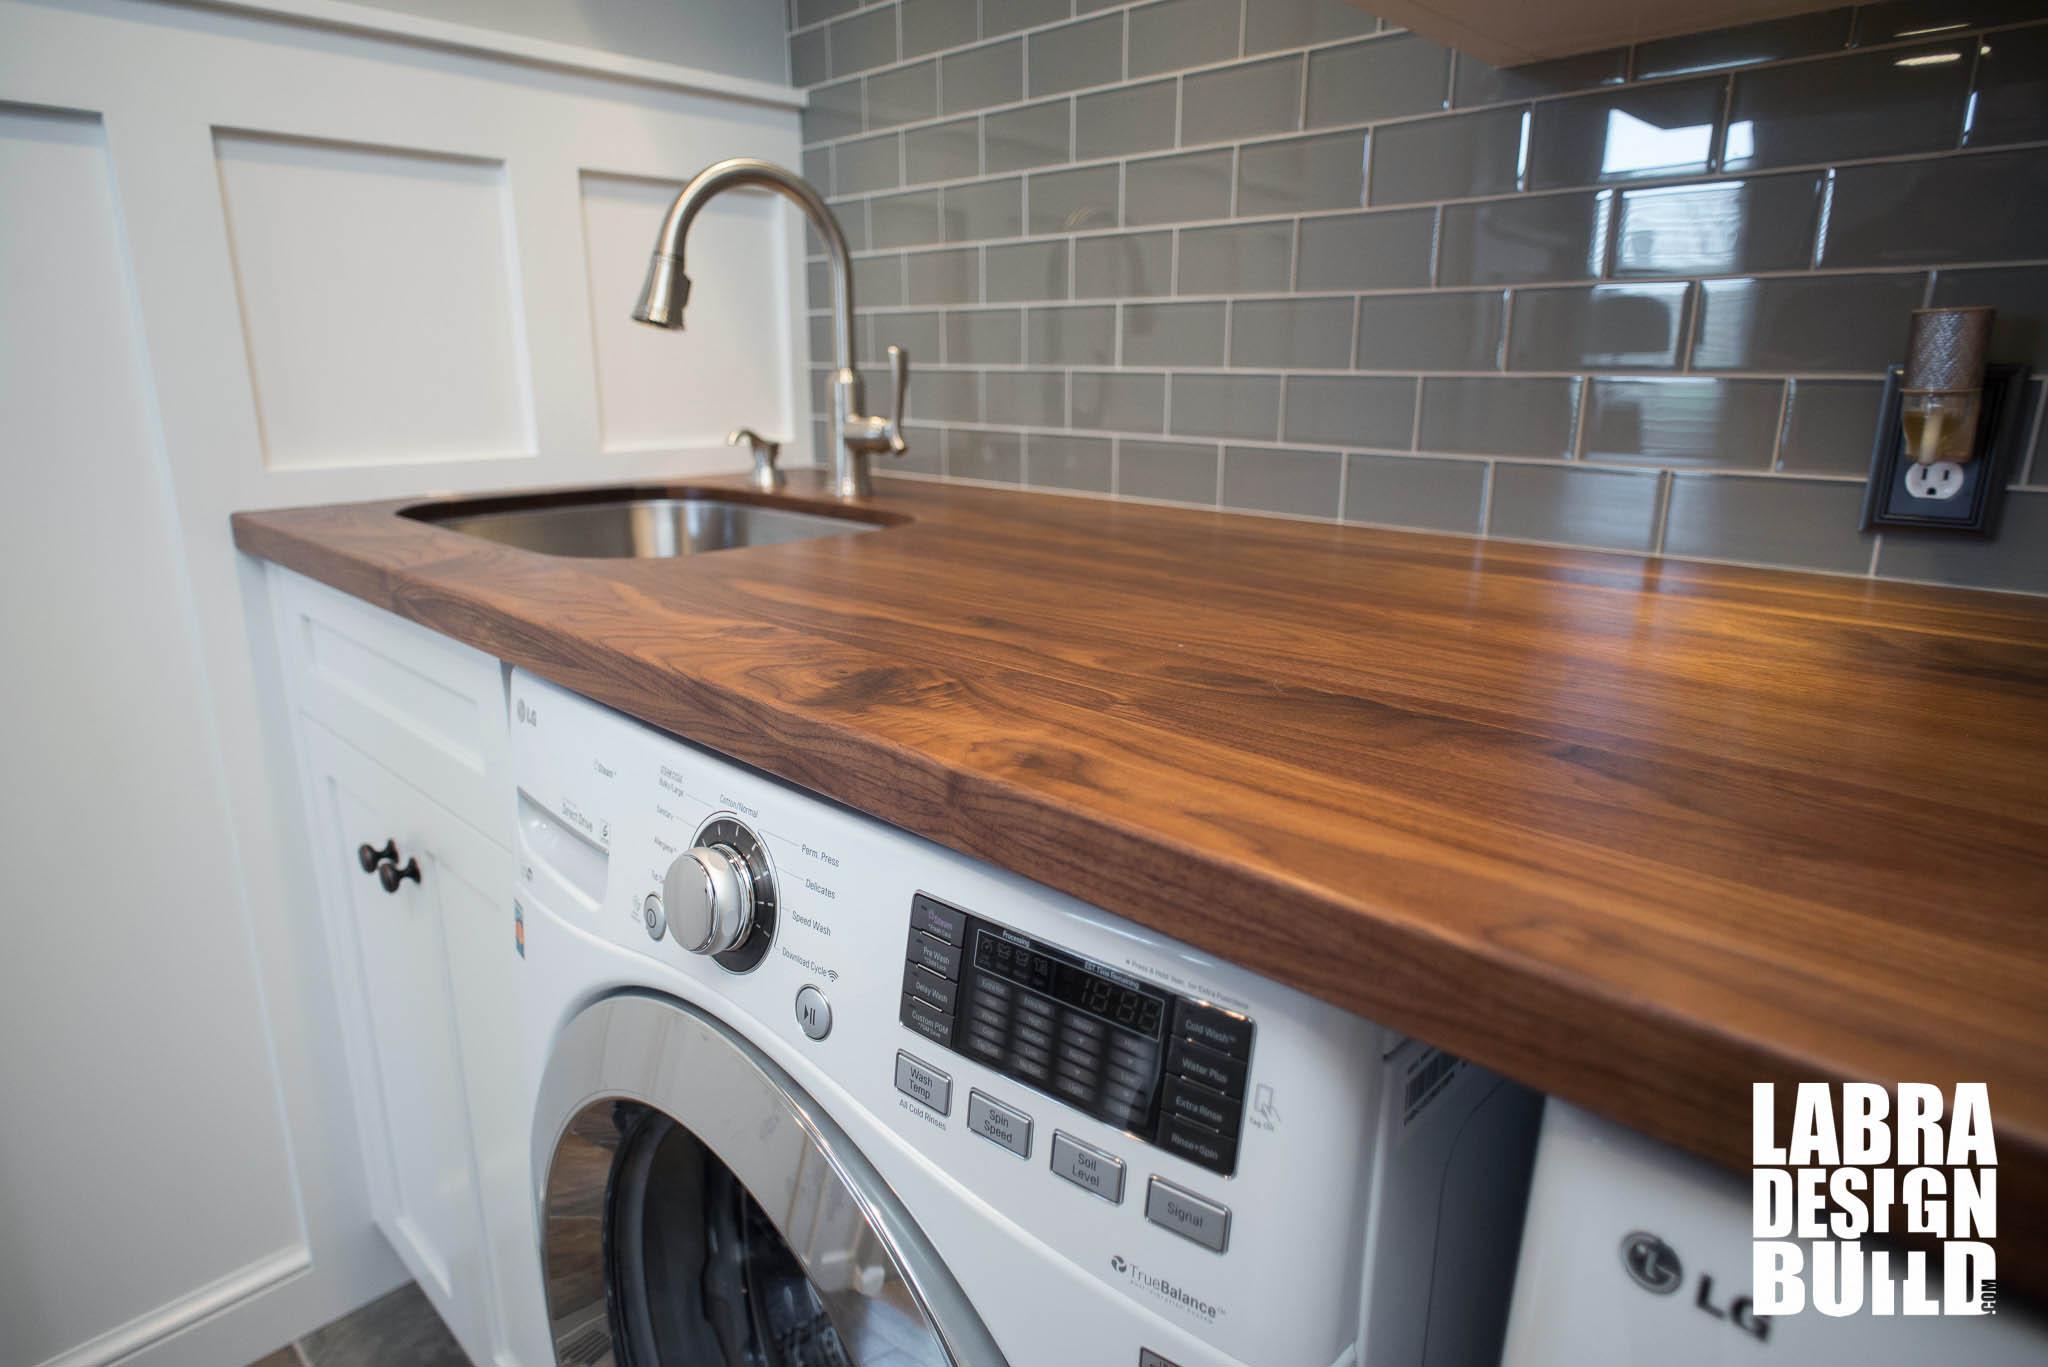 remodel small kitchen home depot shelves laundry room & mudroom renovation, novi mi labra design build